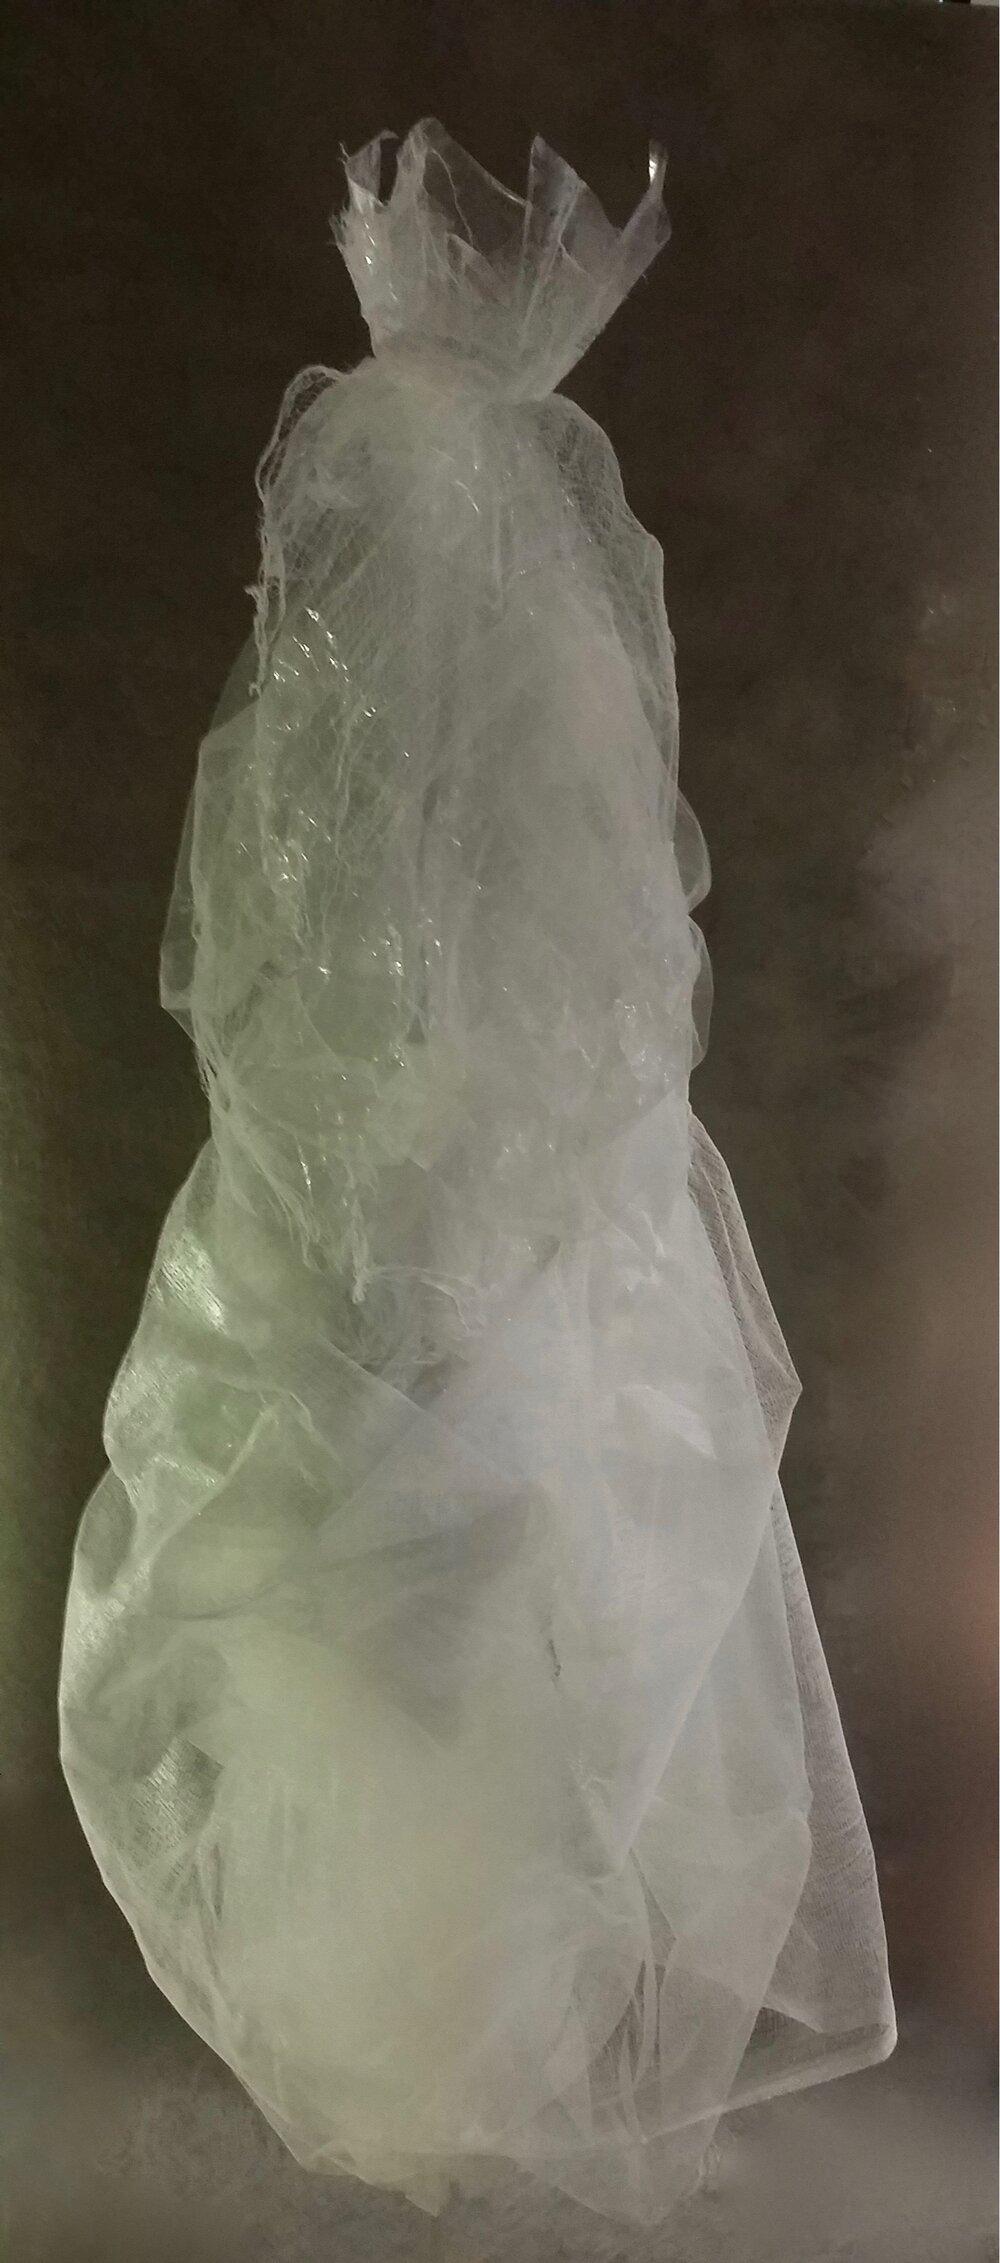 I, The Queen, 2016  84 X 28 x 26 inches  Plastic film, gauze, tulle, nylon thread,white glue, plexiglass tube on wood base